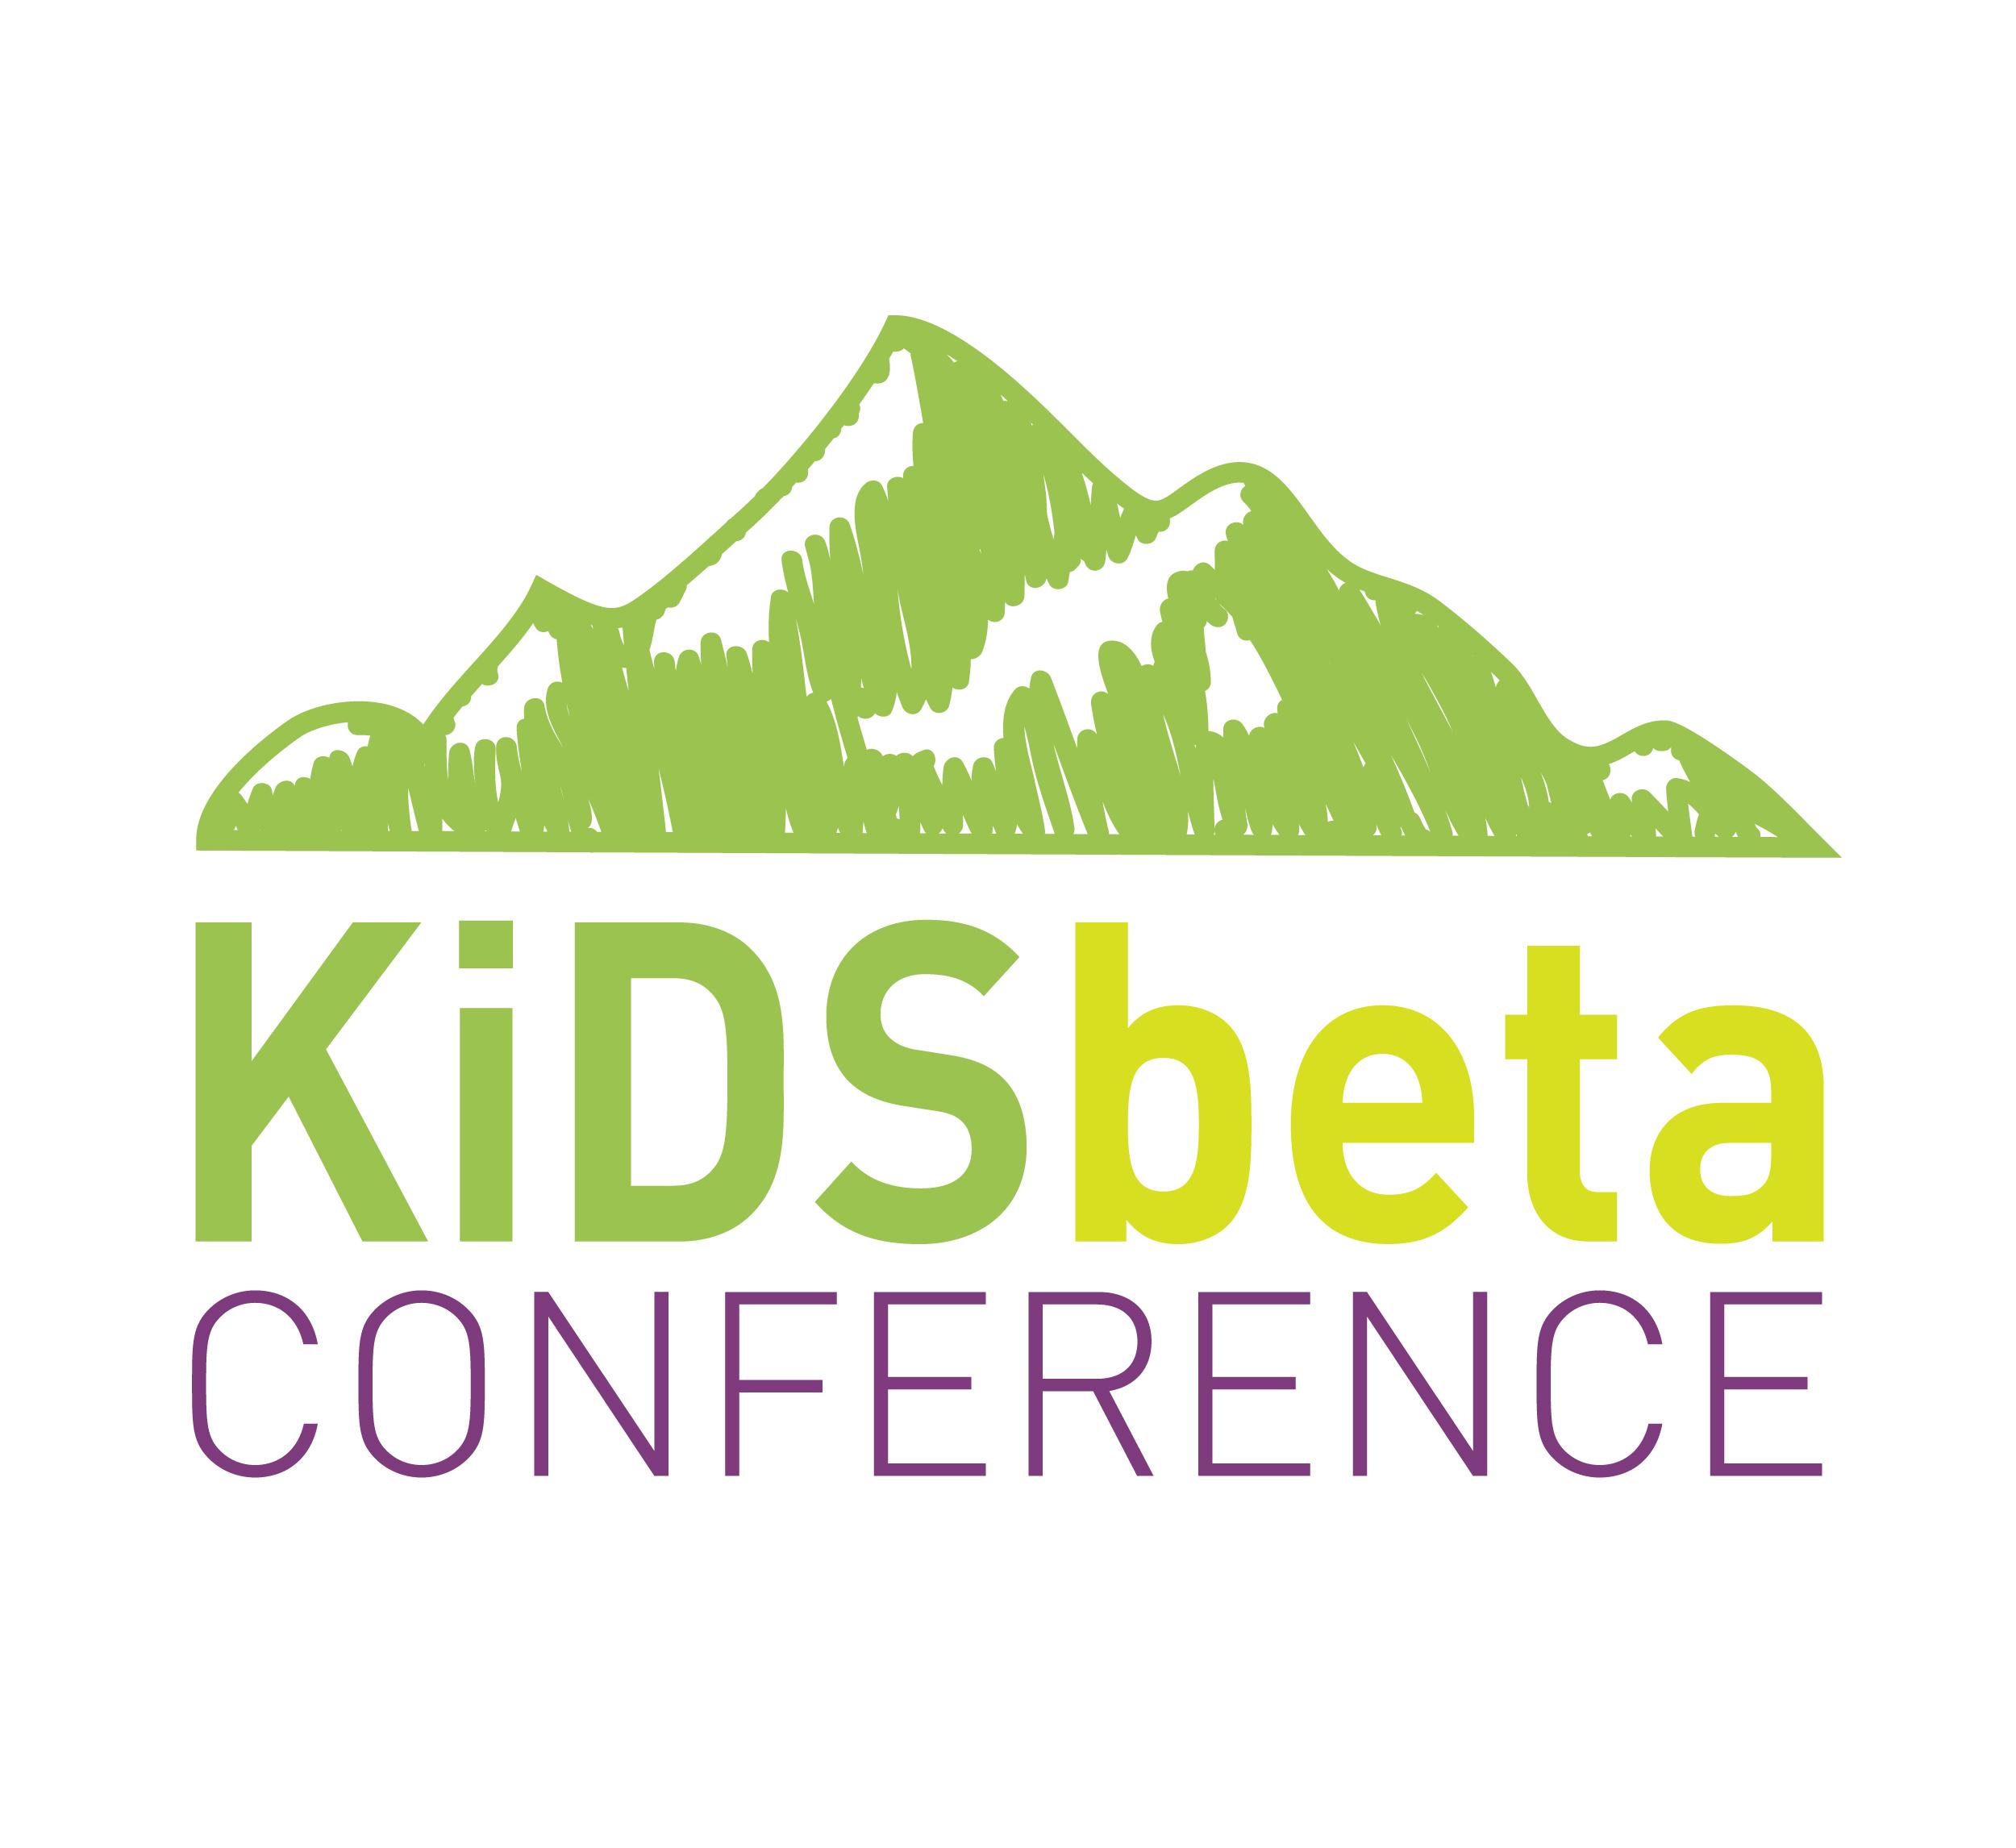 kids-beta-logo.jpg